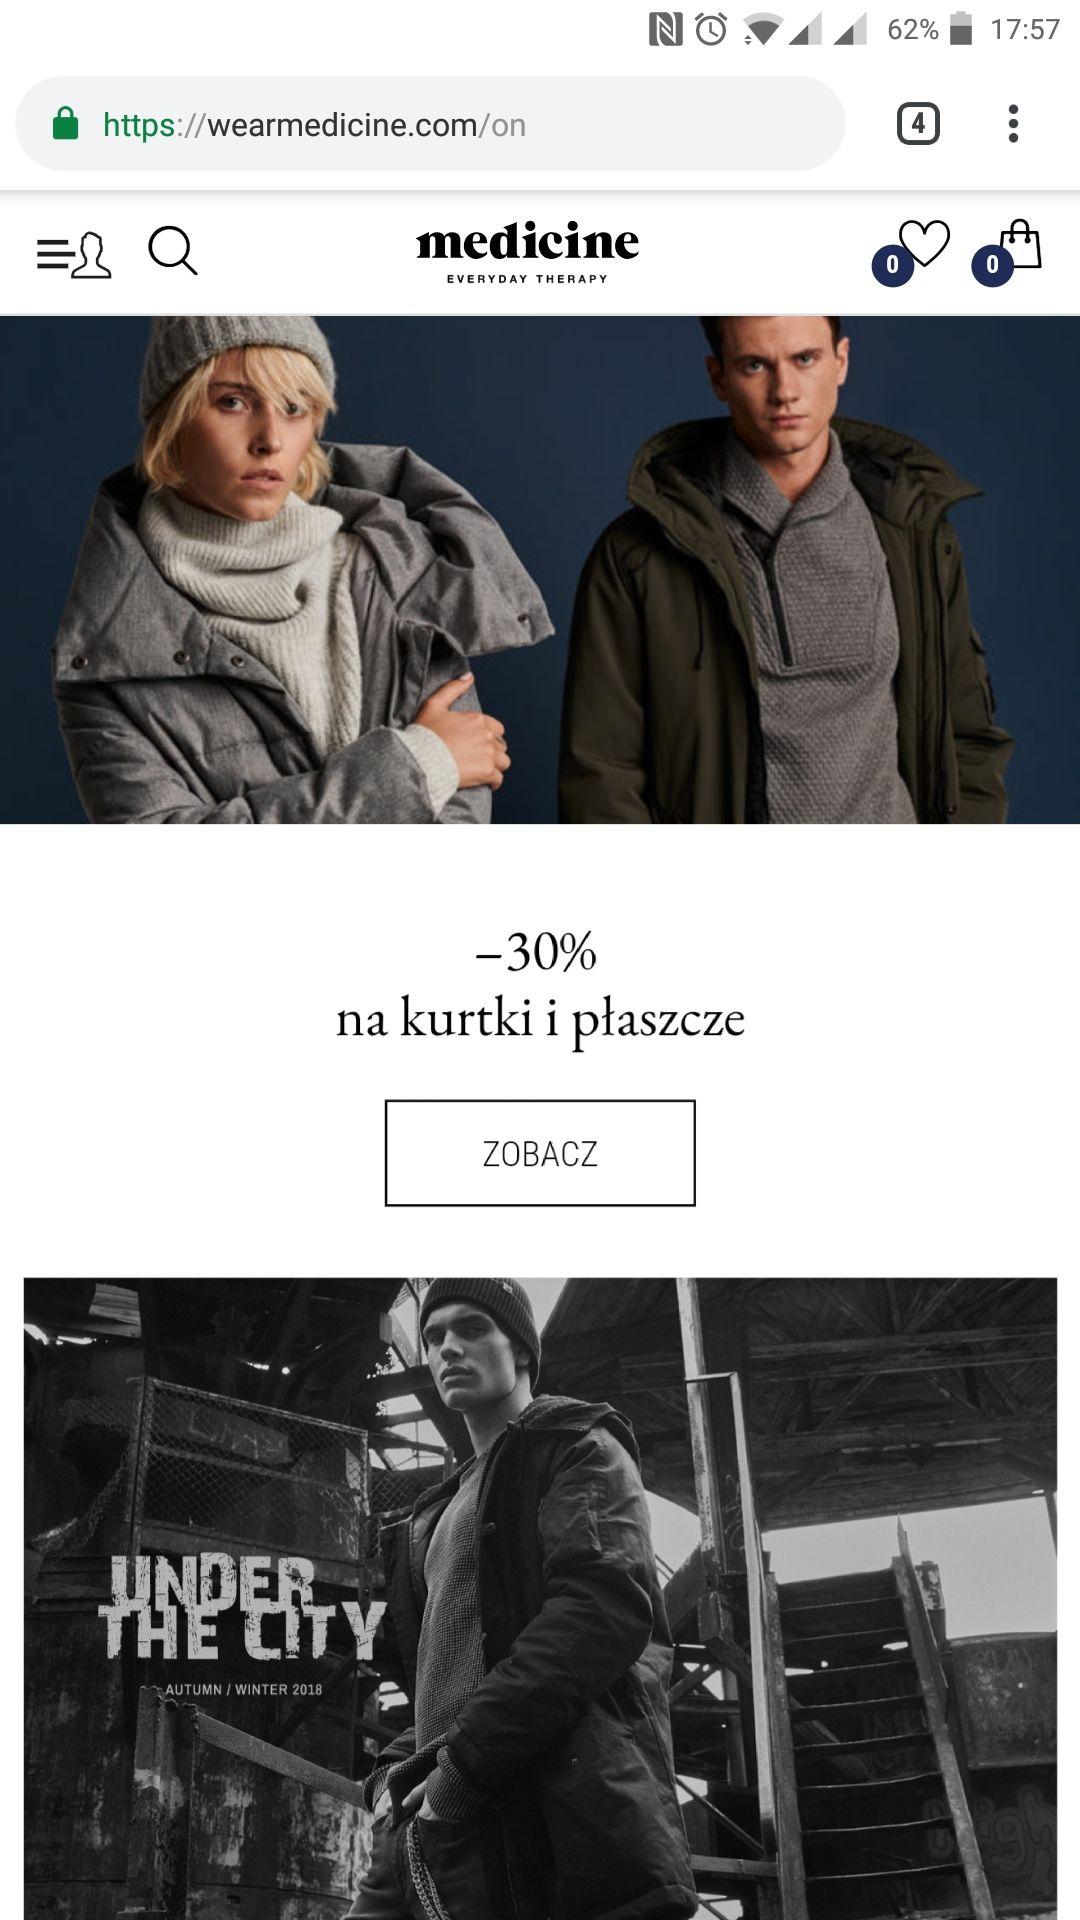 MEDICINE kurtki i płaszcze -30%